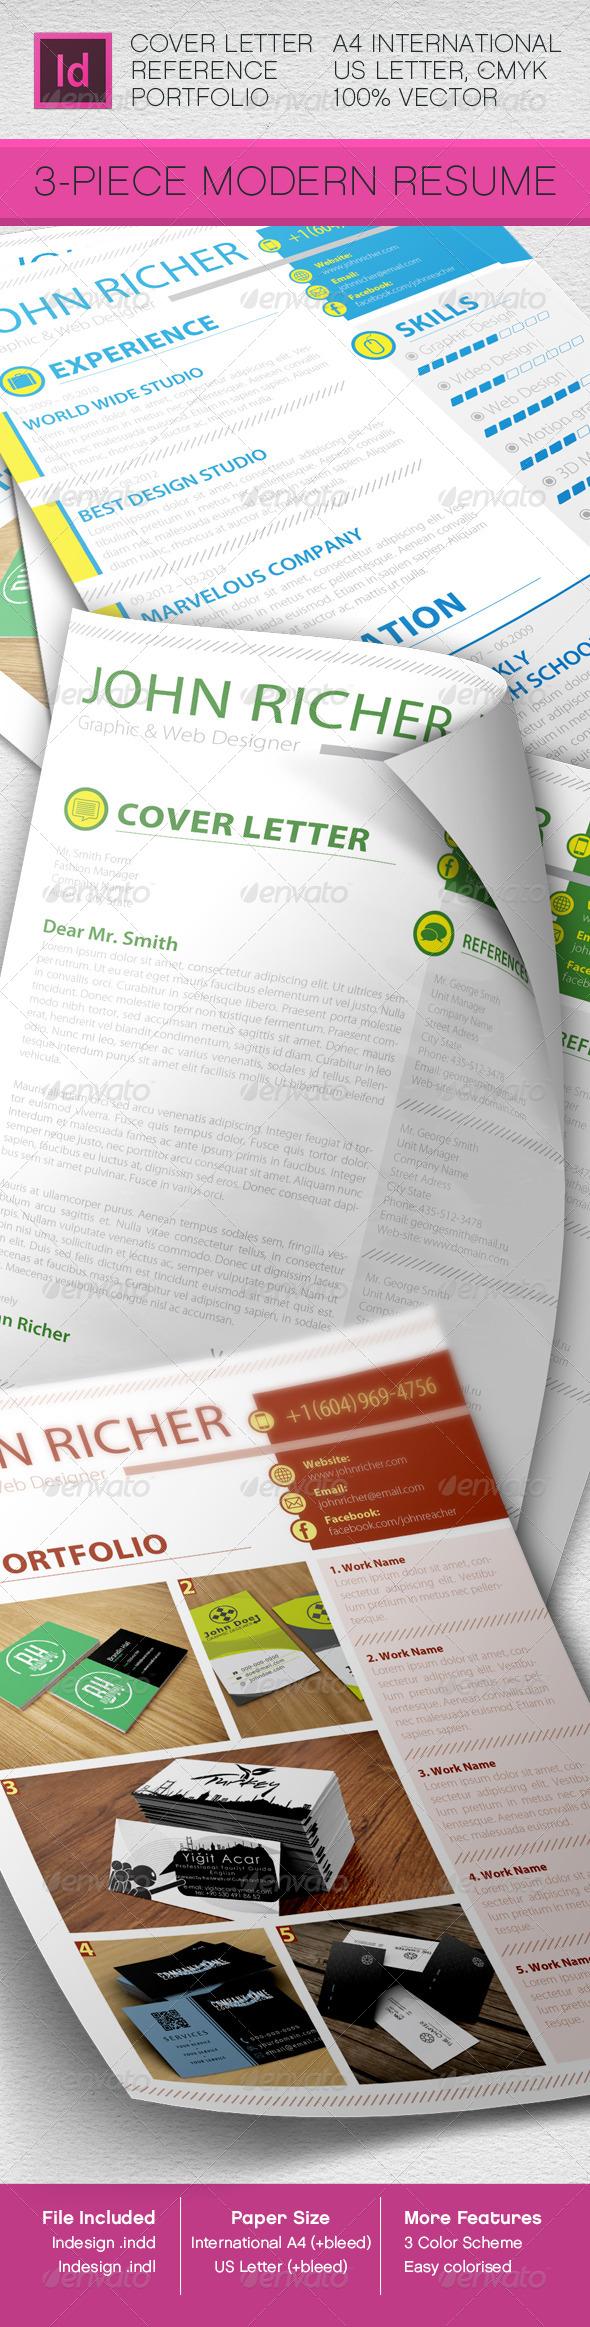 GraphicRiver 3-Piece Modern Rezume CV 5361051